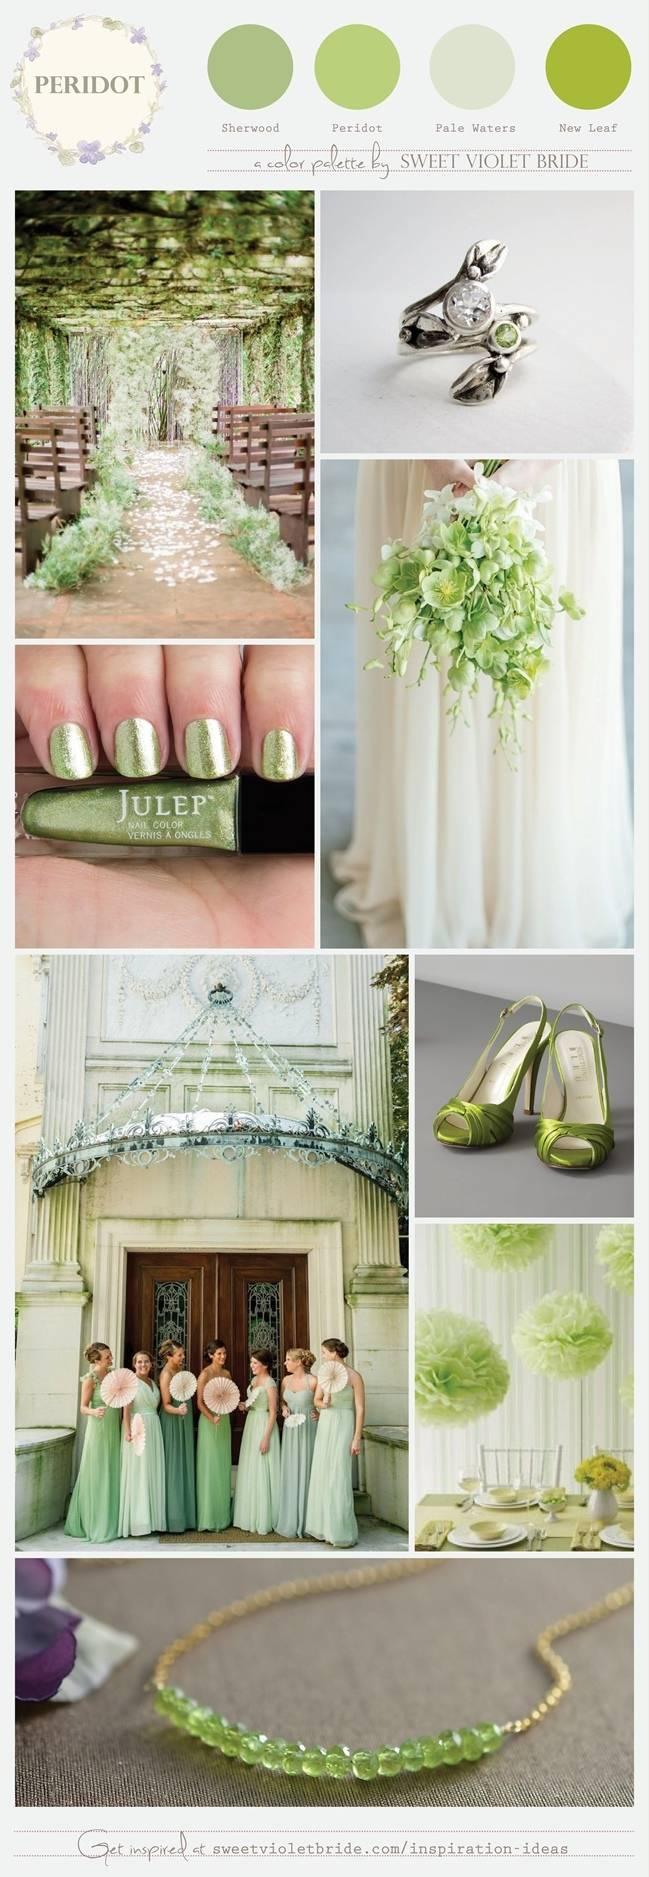 Wedding Color Palette: Peridot